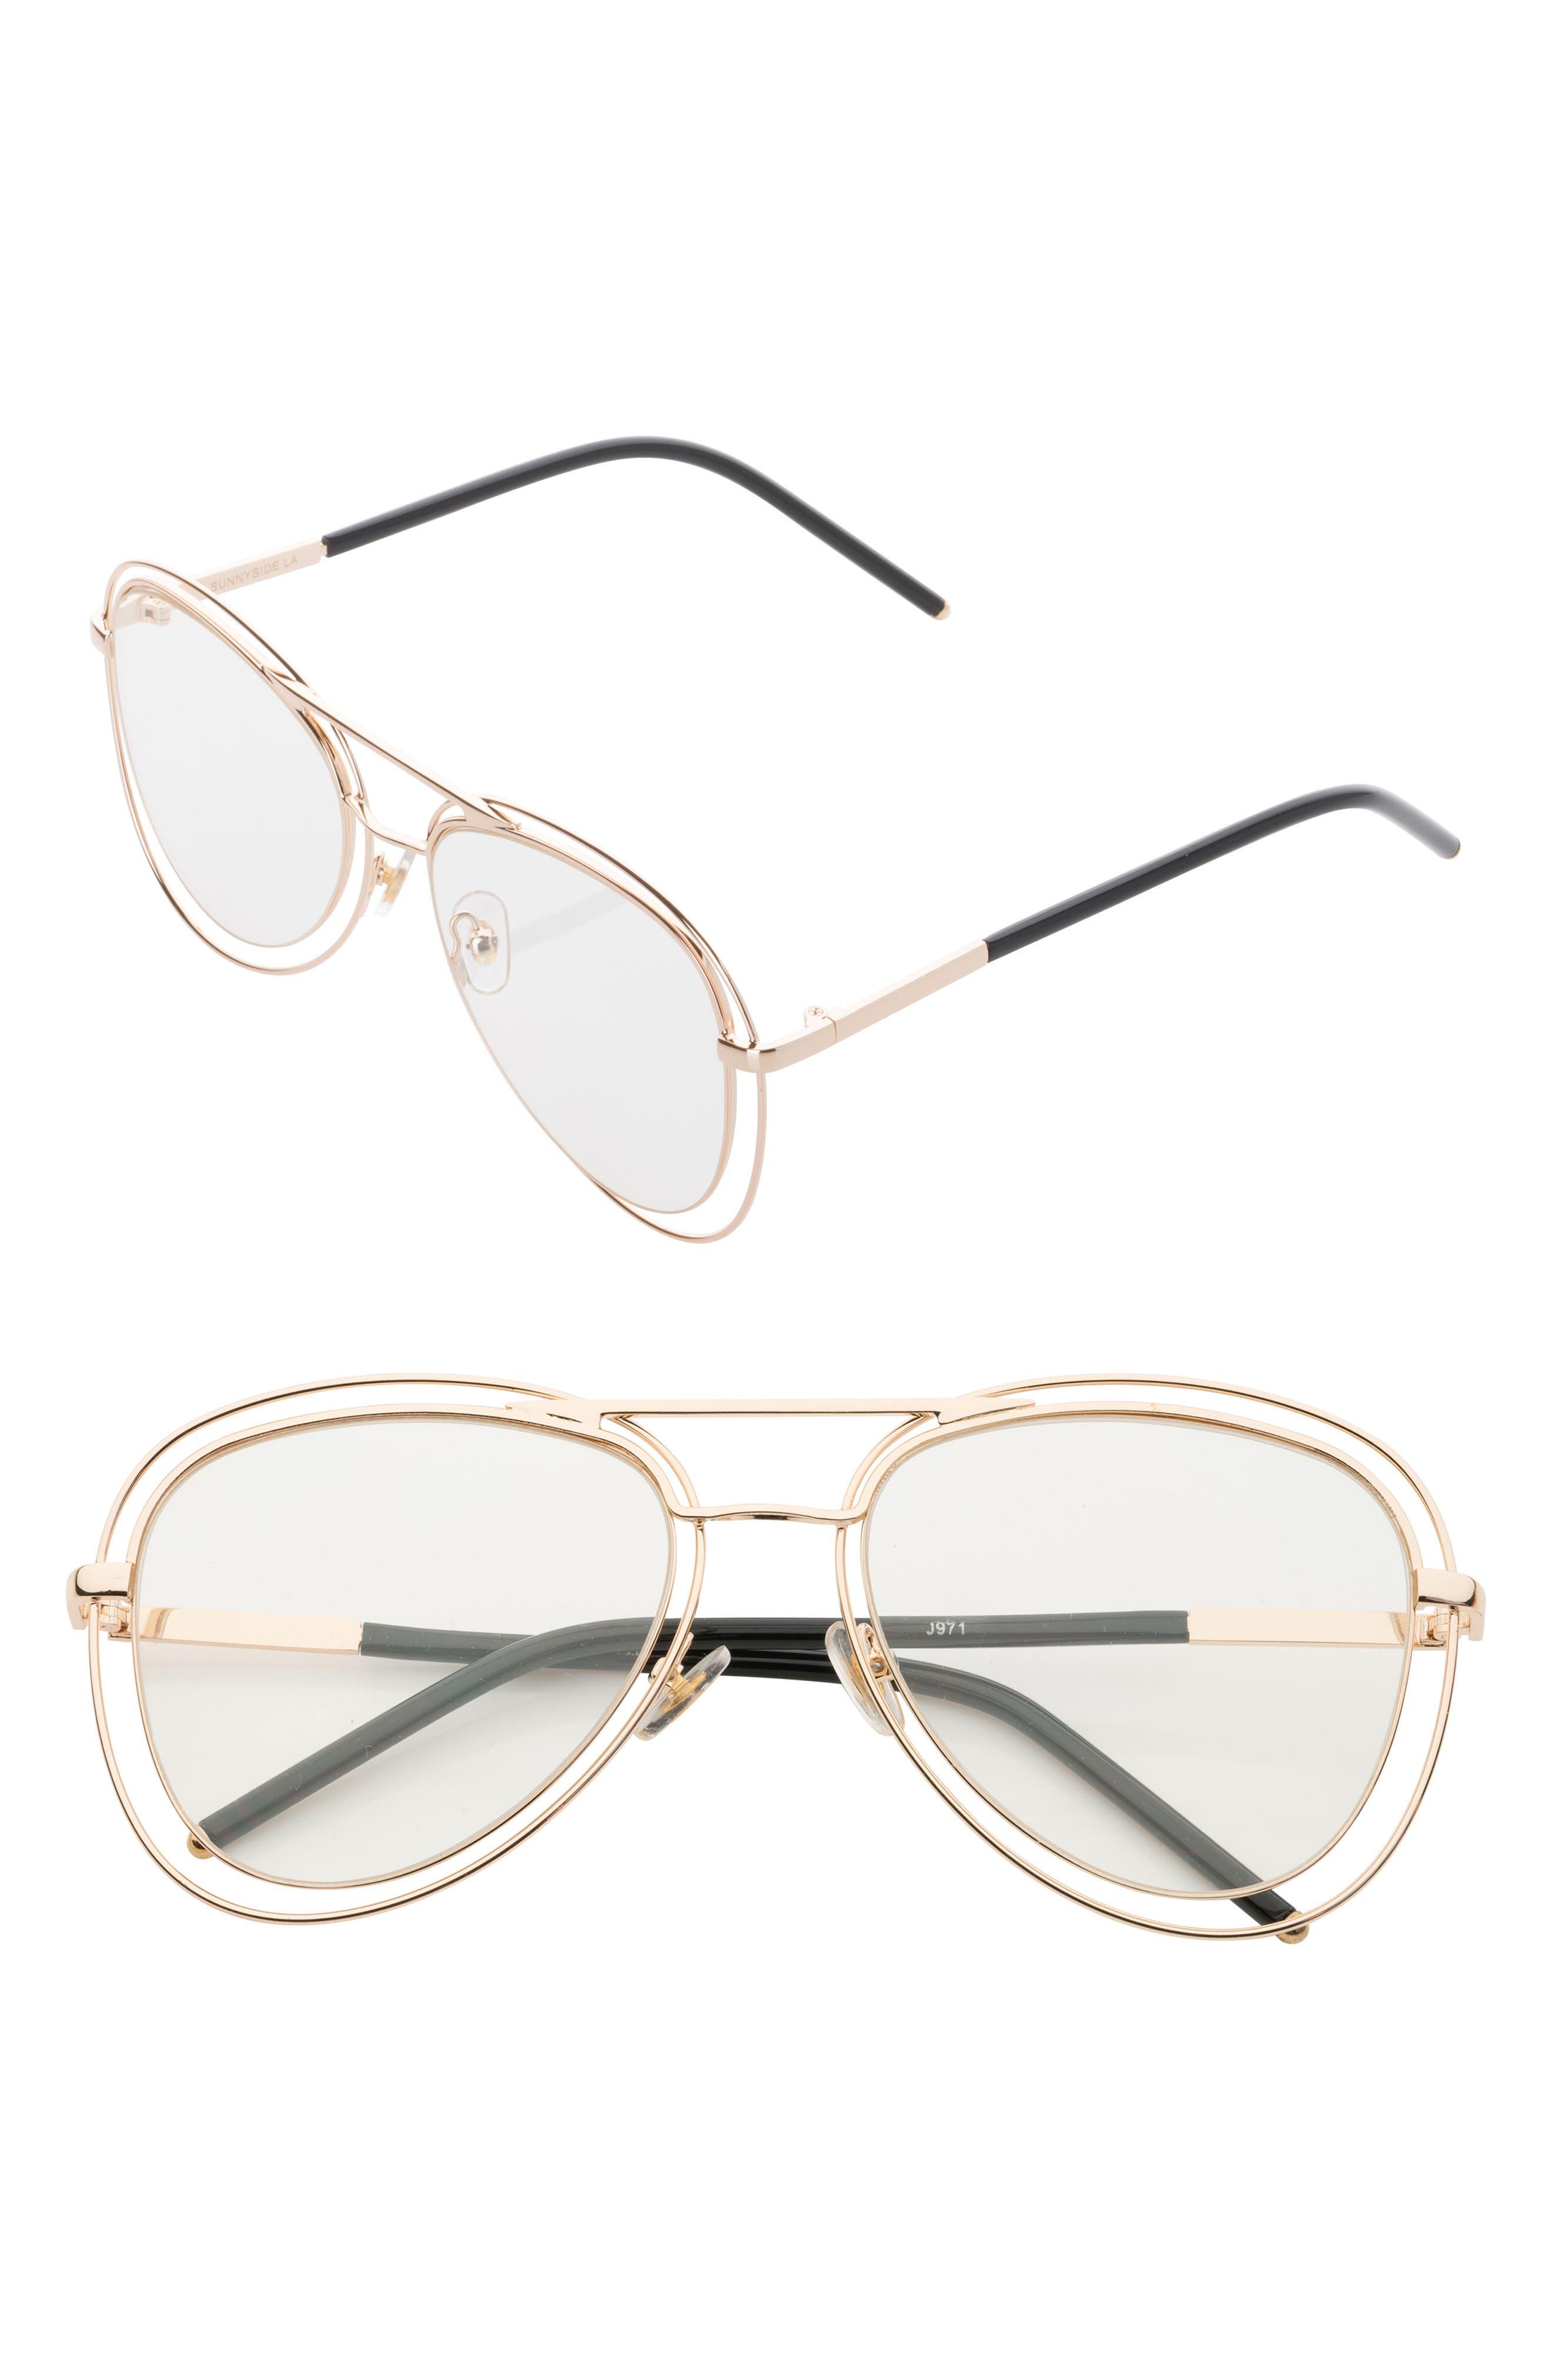 55mm Aviator Fashion Glasses,                             Main thumbnail 1, color,                             Gold